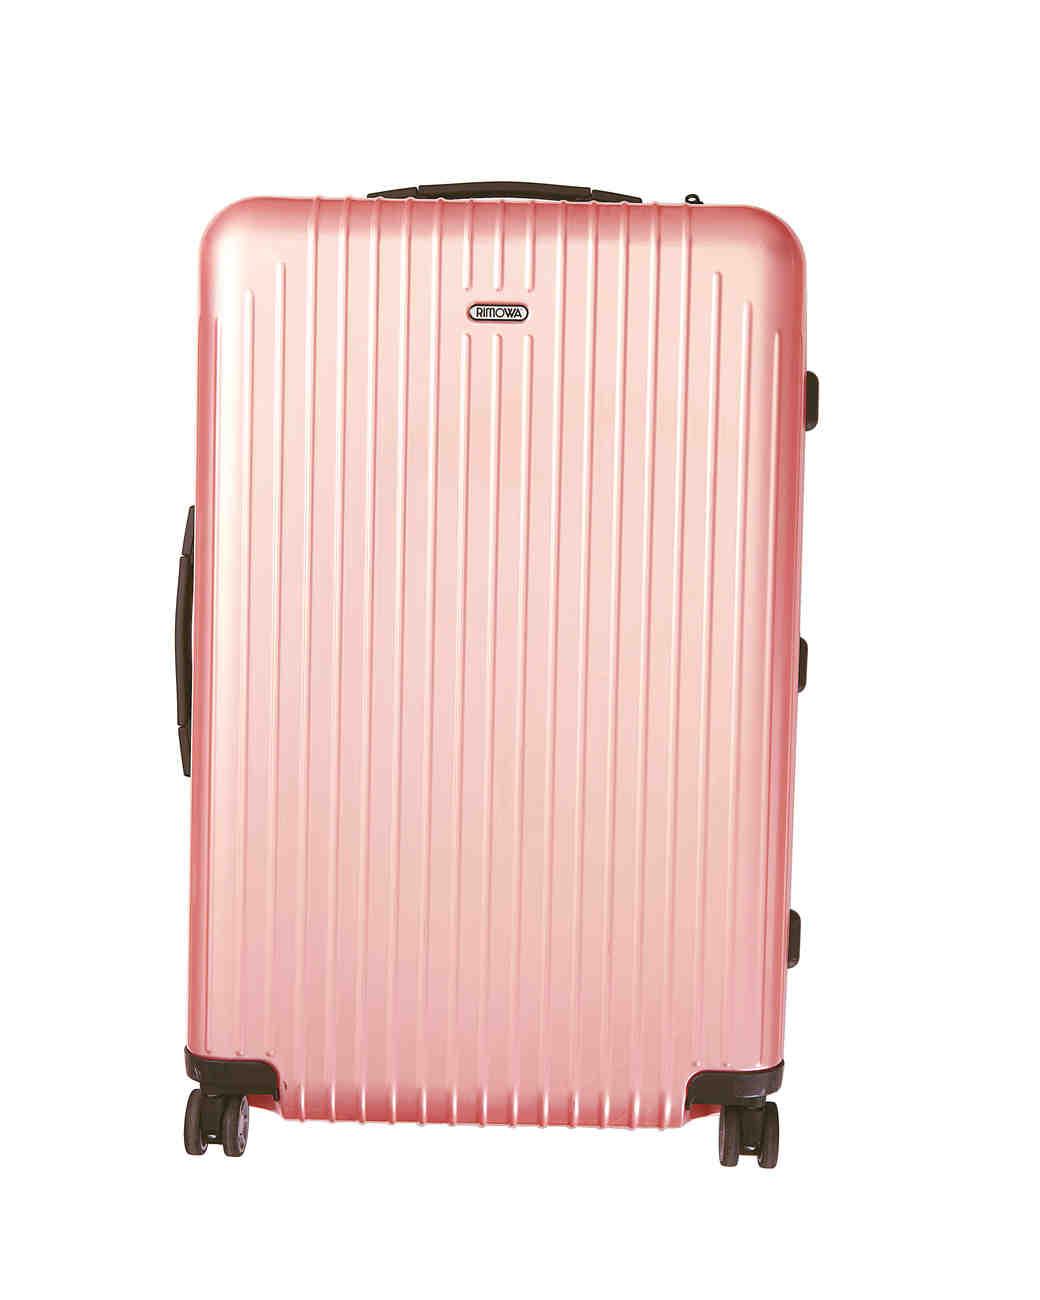 pink-suitcase-283-mwd110671.jpg